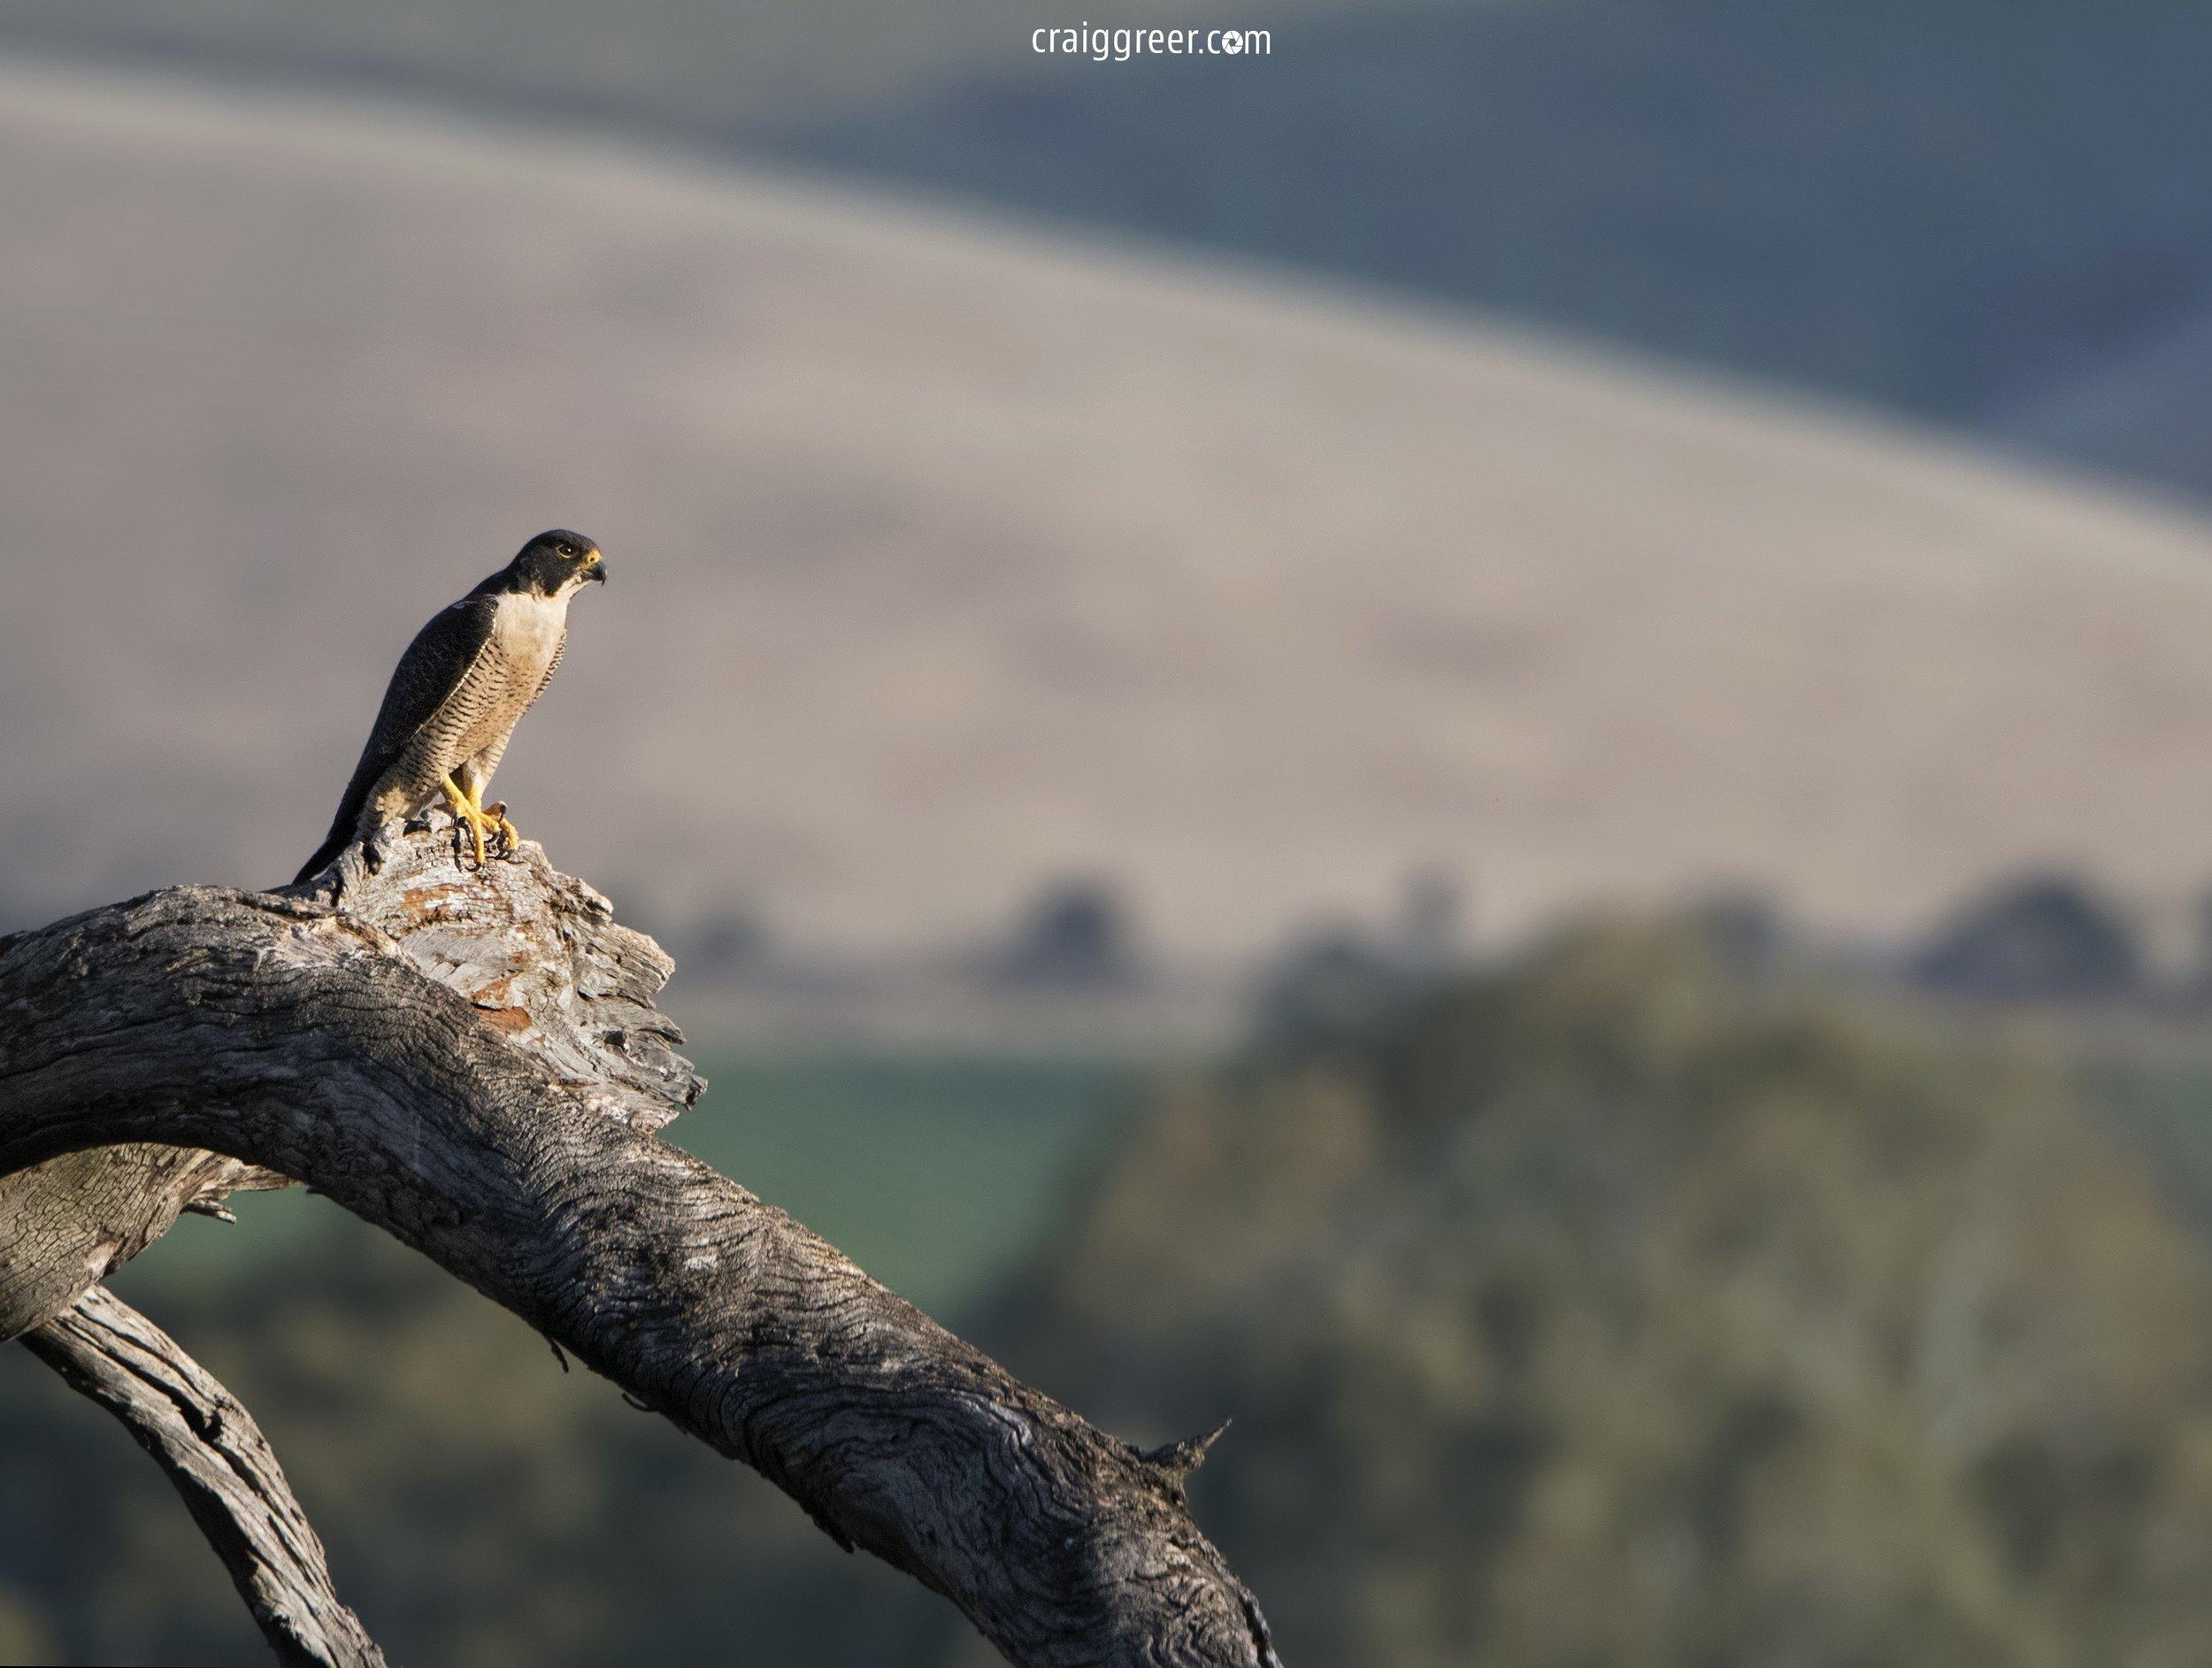 Peregrine-Falcon-wide-30-10-18.jpg